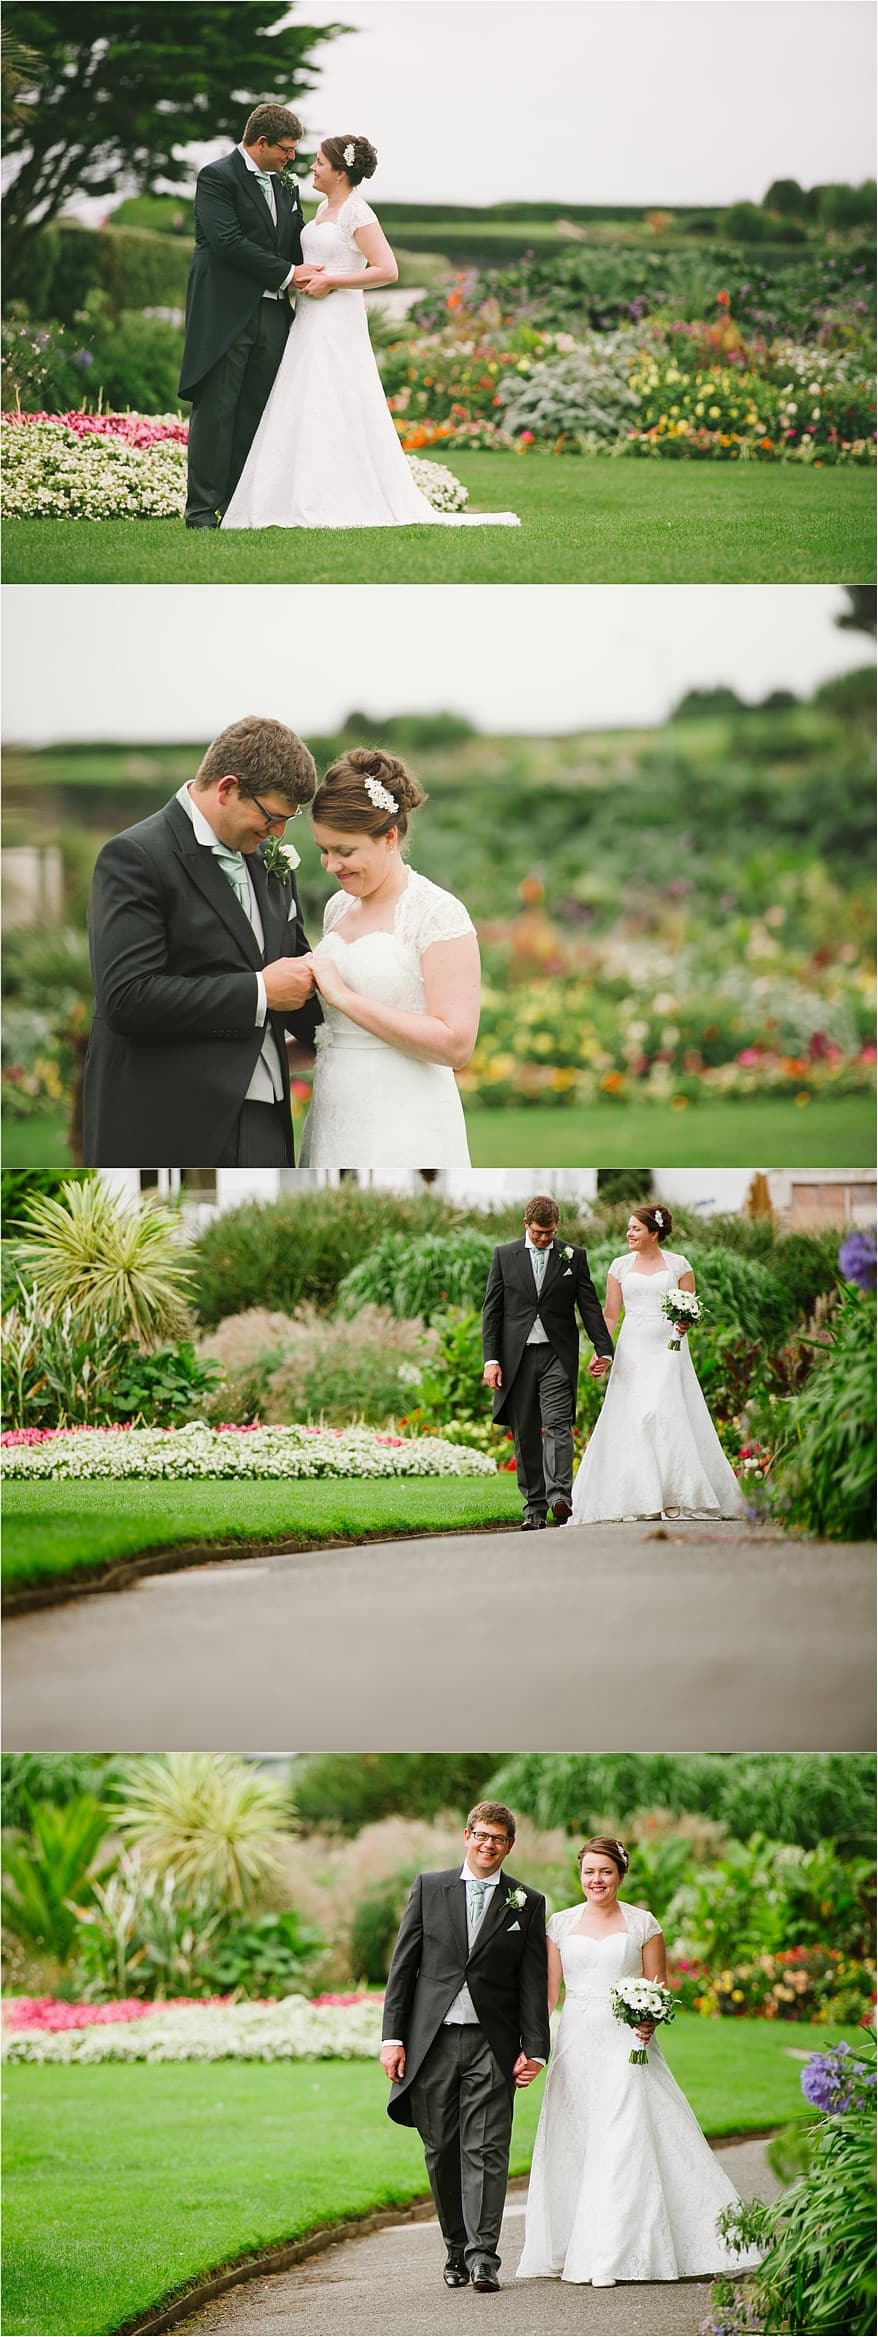 Wedding at St Michaels Hotel 13 St Michaels Hotel Wedding Photographer